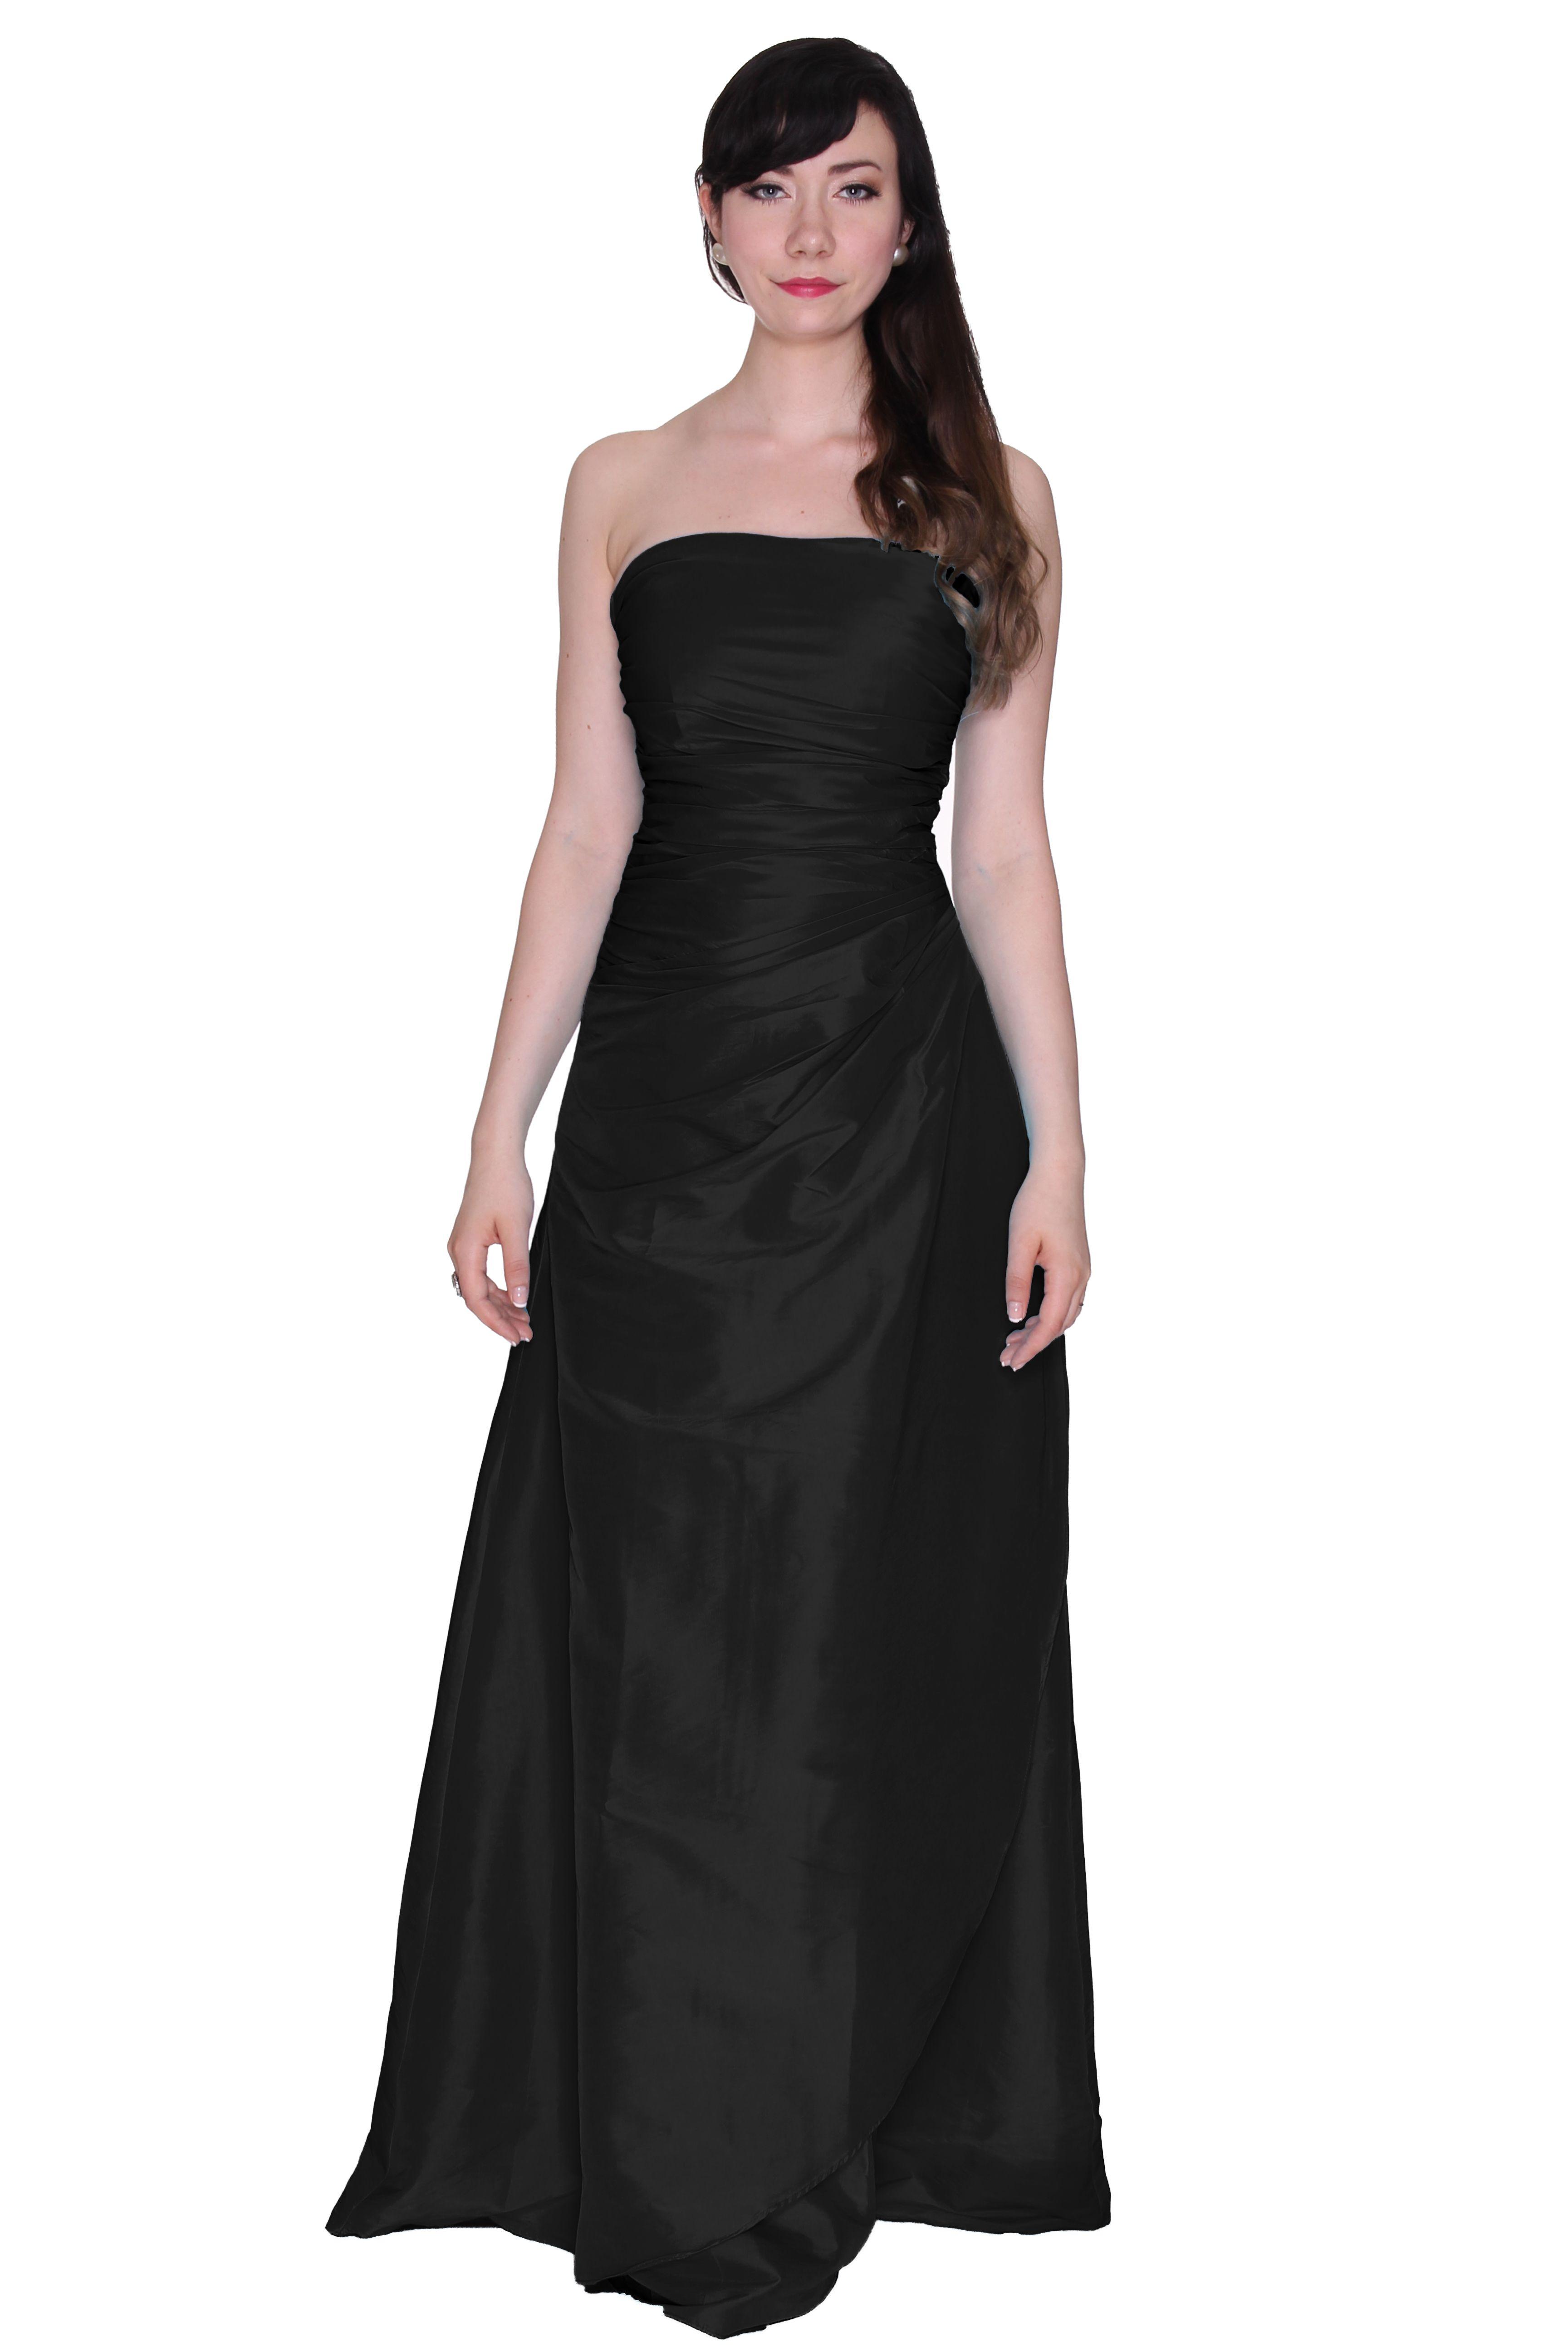 Beautifly womenus watercolored taffeta strapless long ball gown